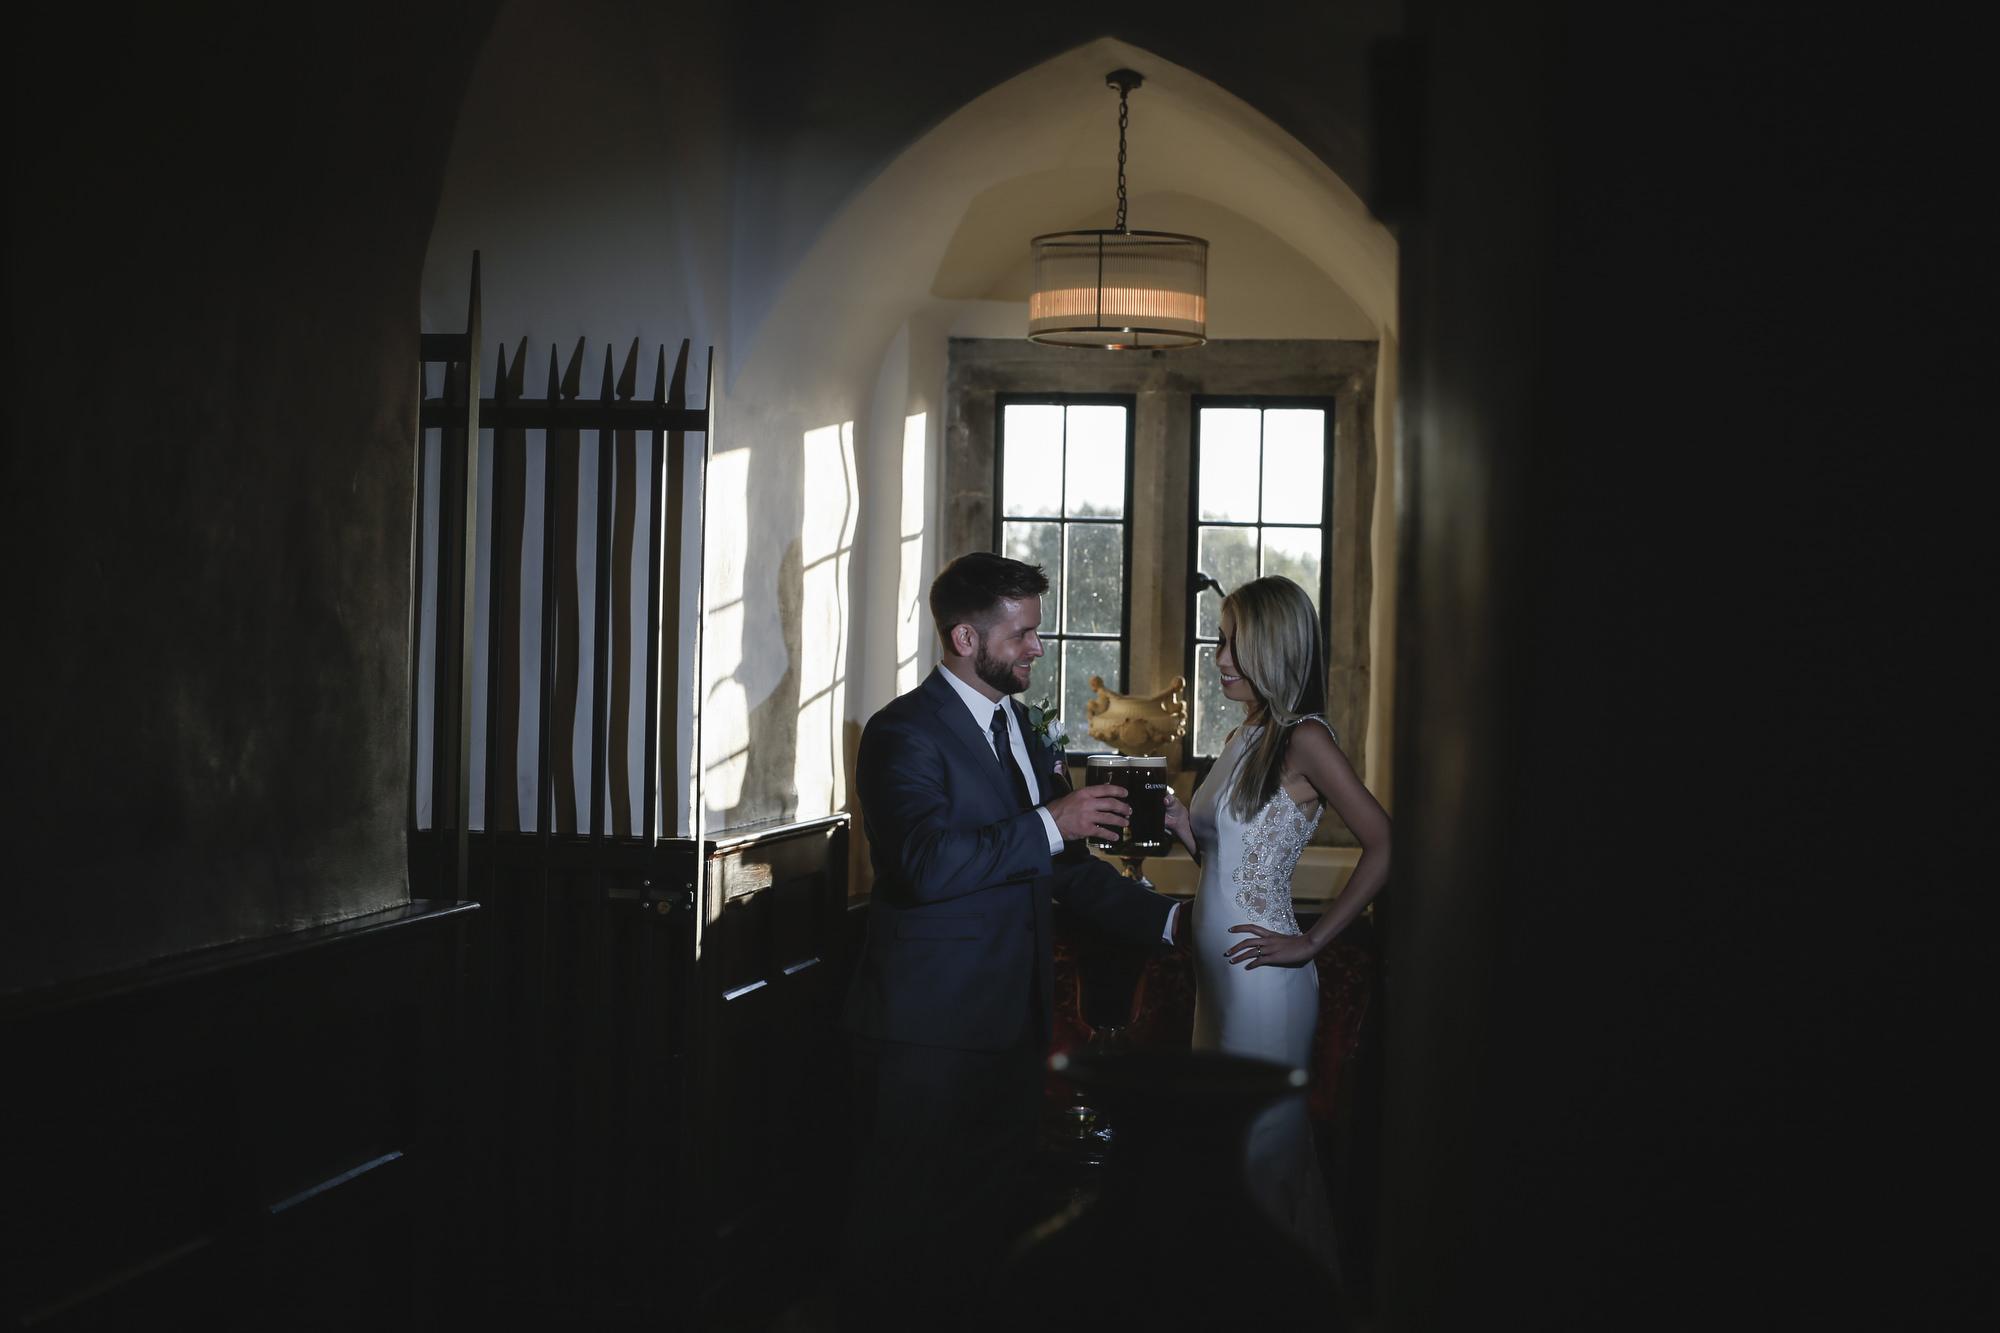 kilkea_castle_wedding_photographer_goldenmoments_056.jpg